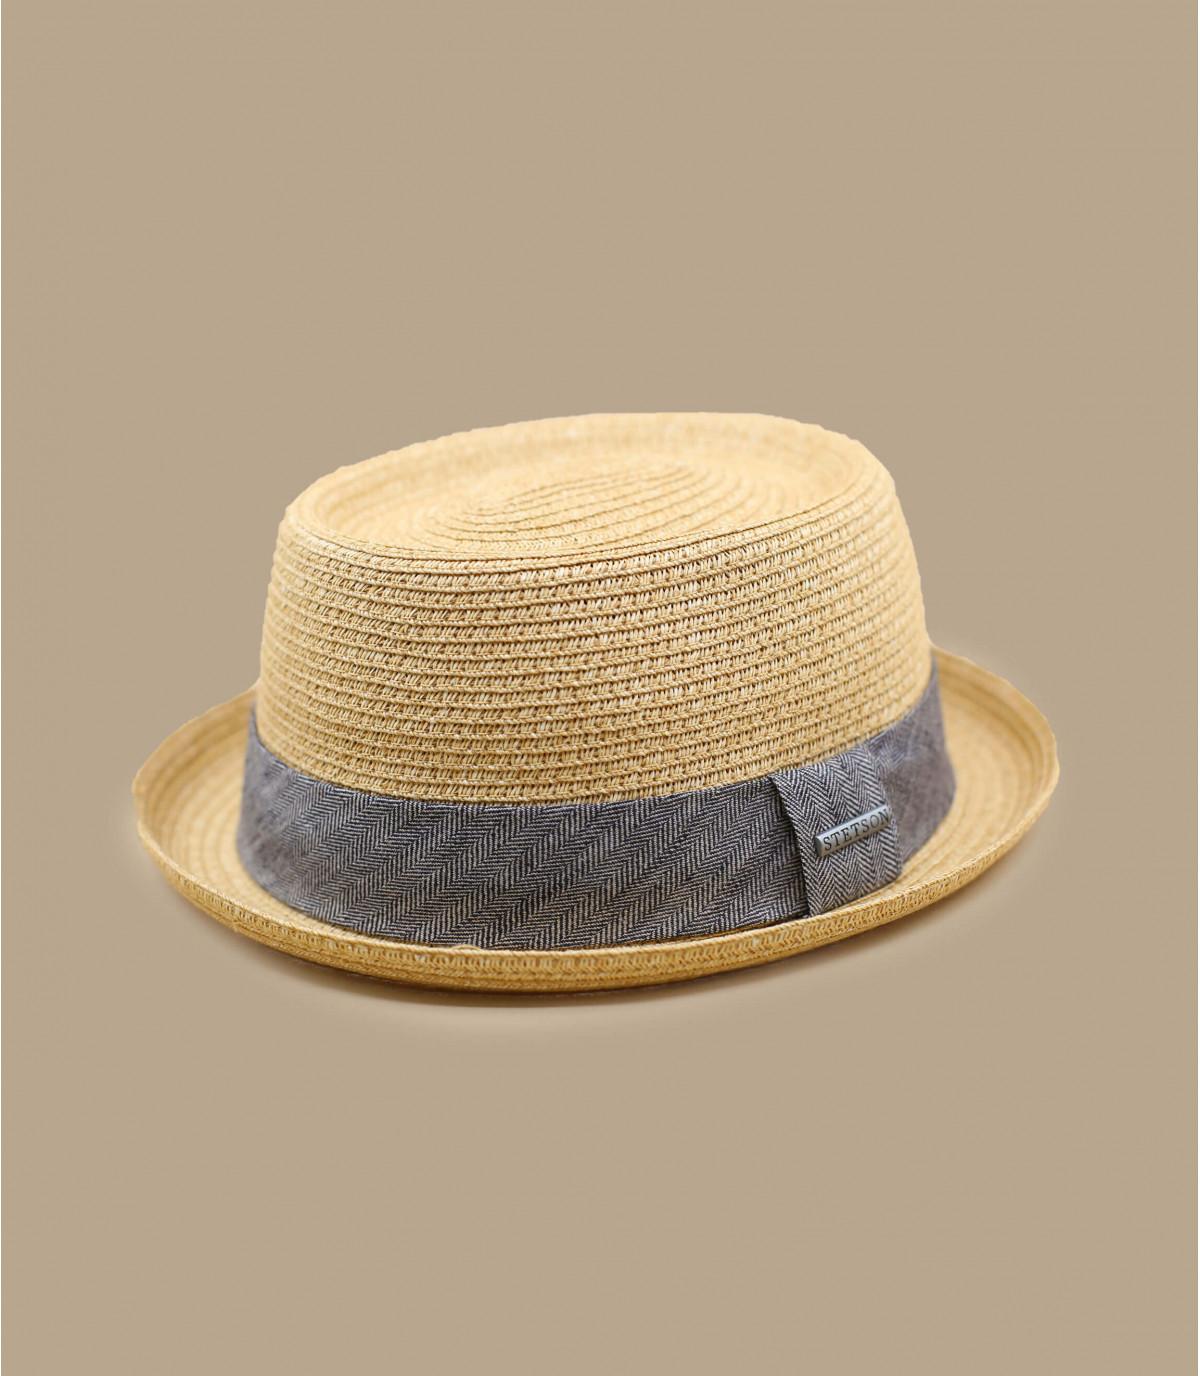 9fb0a8d34 Pork pie hat - Buy online pork pie hats.